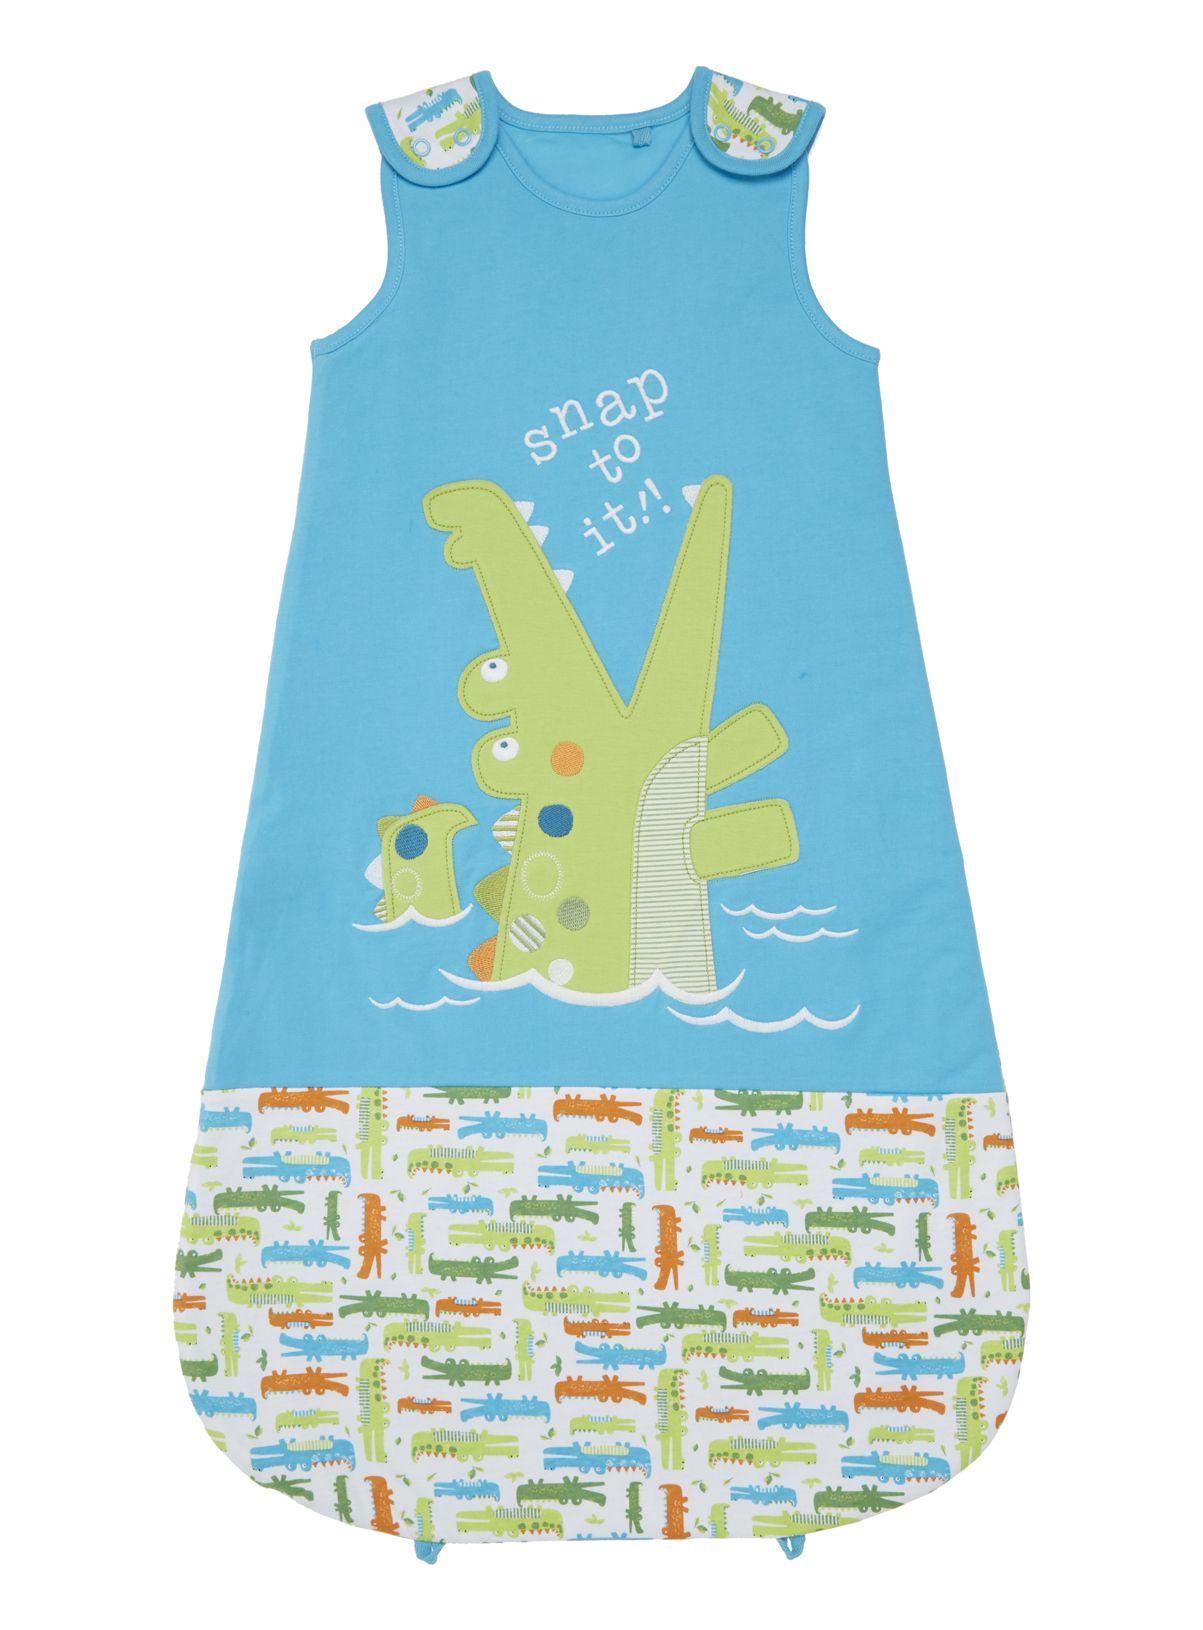 free shipping 7405e 287a0 Baby Boys Green Printed Sleeping Bag (0-24 months) | Tu ...